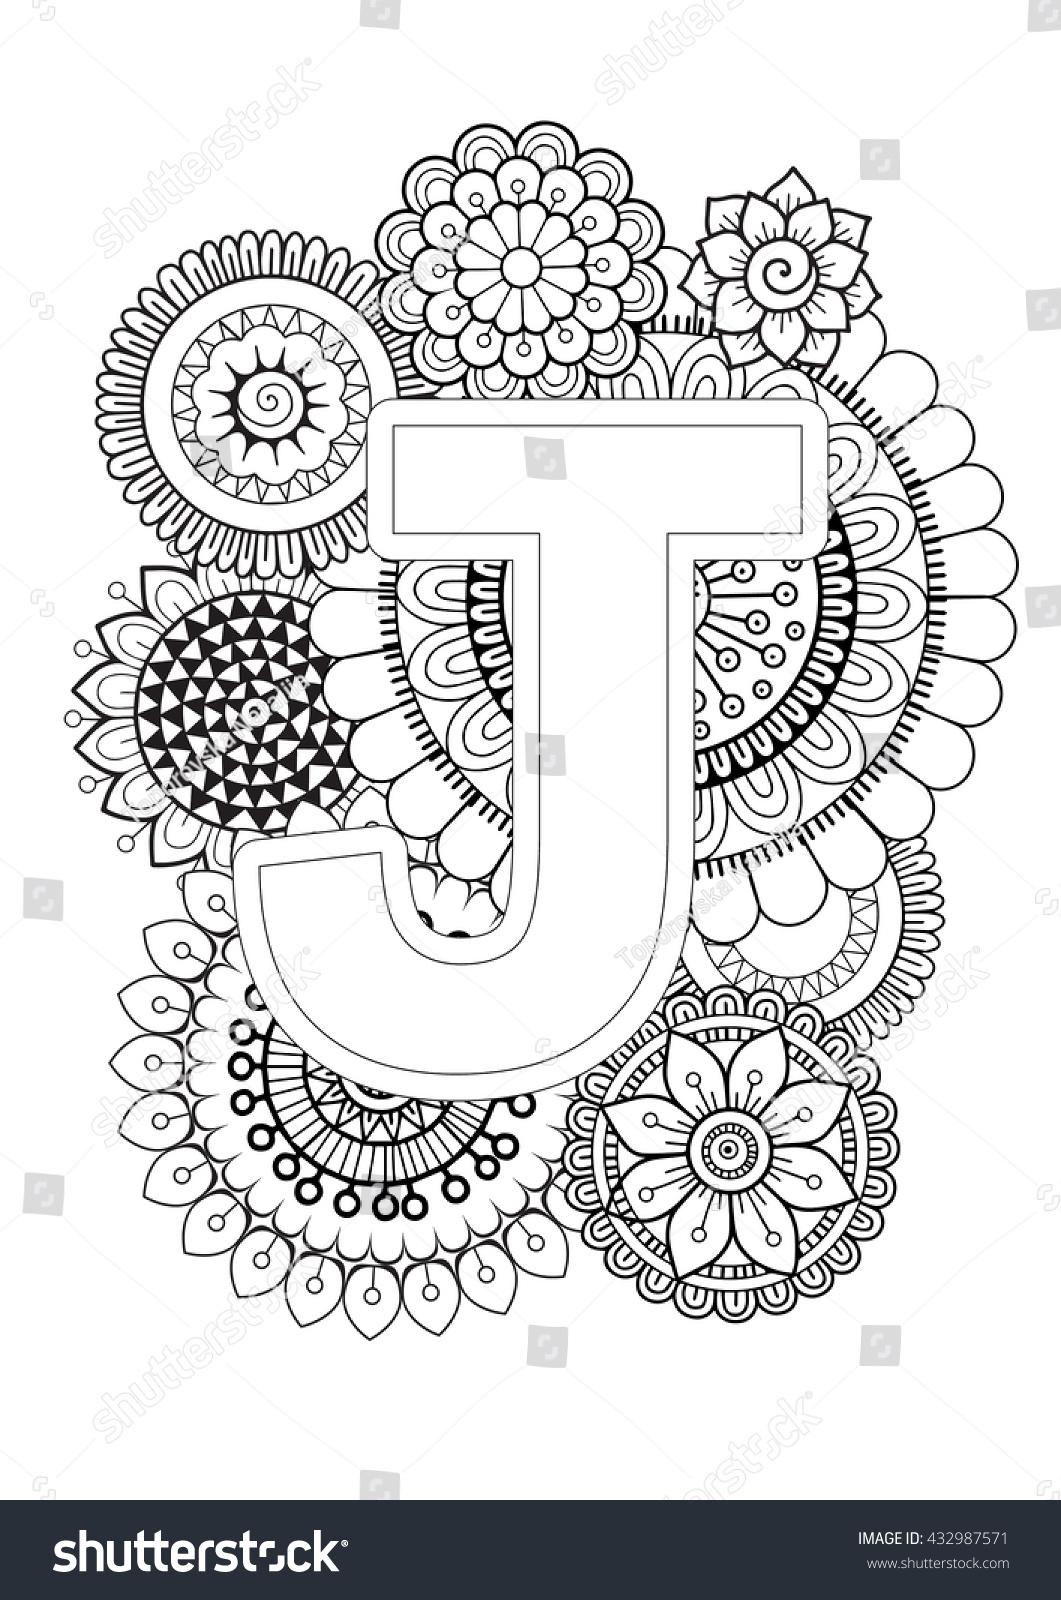 doodle floral letters coloring book adult stock vector 432987571 shutterstock. Black Bedroom Furniture Sets. Home Design Ideas